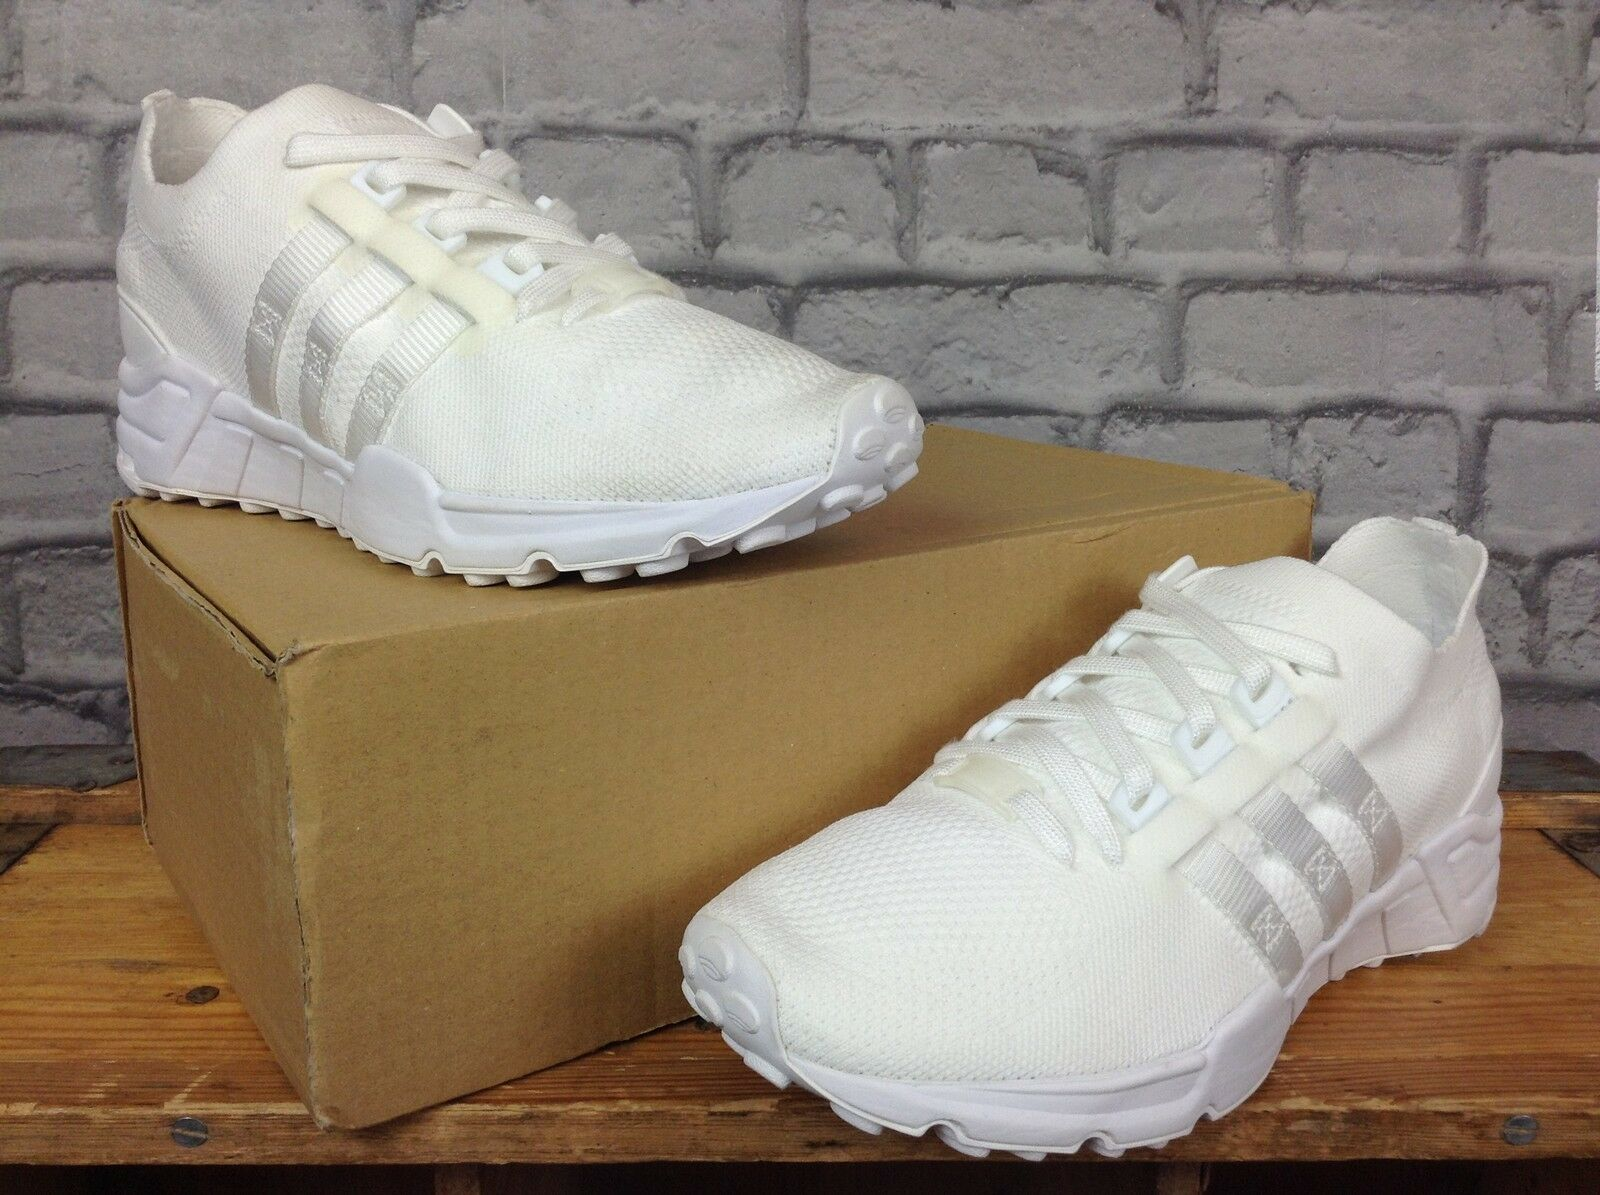 adidas Superstar Unisex - blanc noir Leather Trainers - Unisex 6 UK 844093